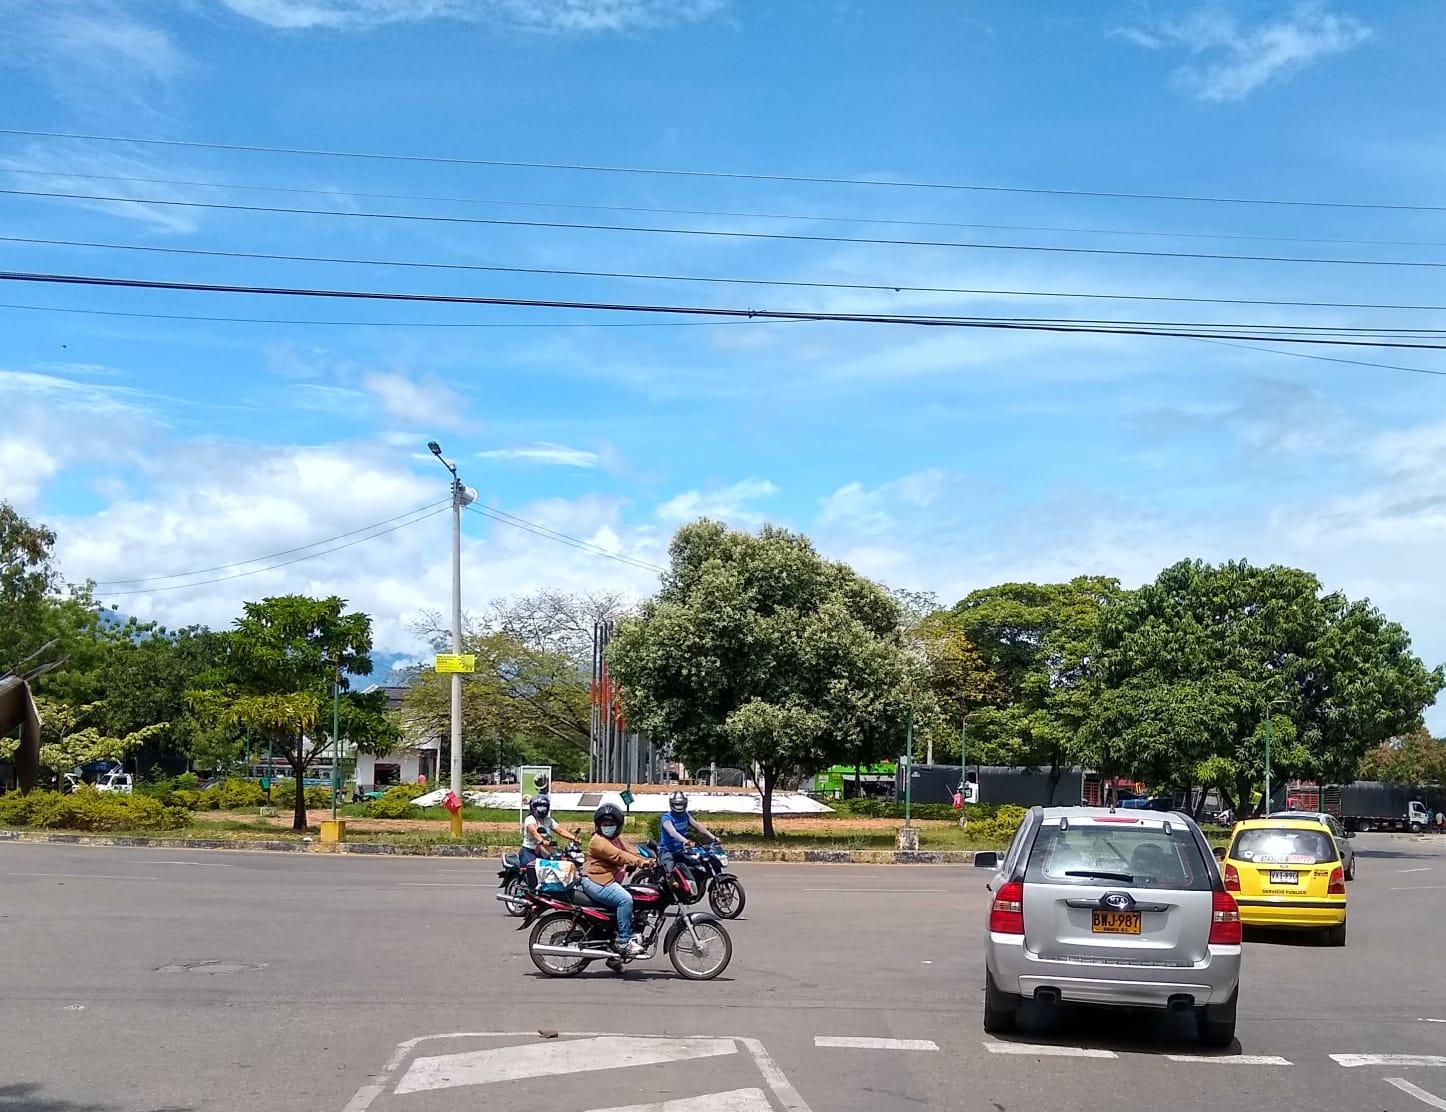 La plaza de 'San Pedro', lugar especial en Neiva